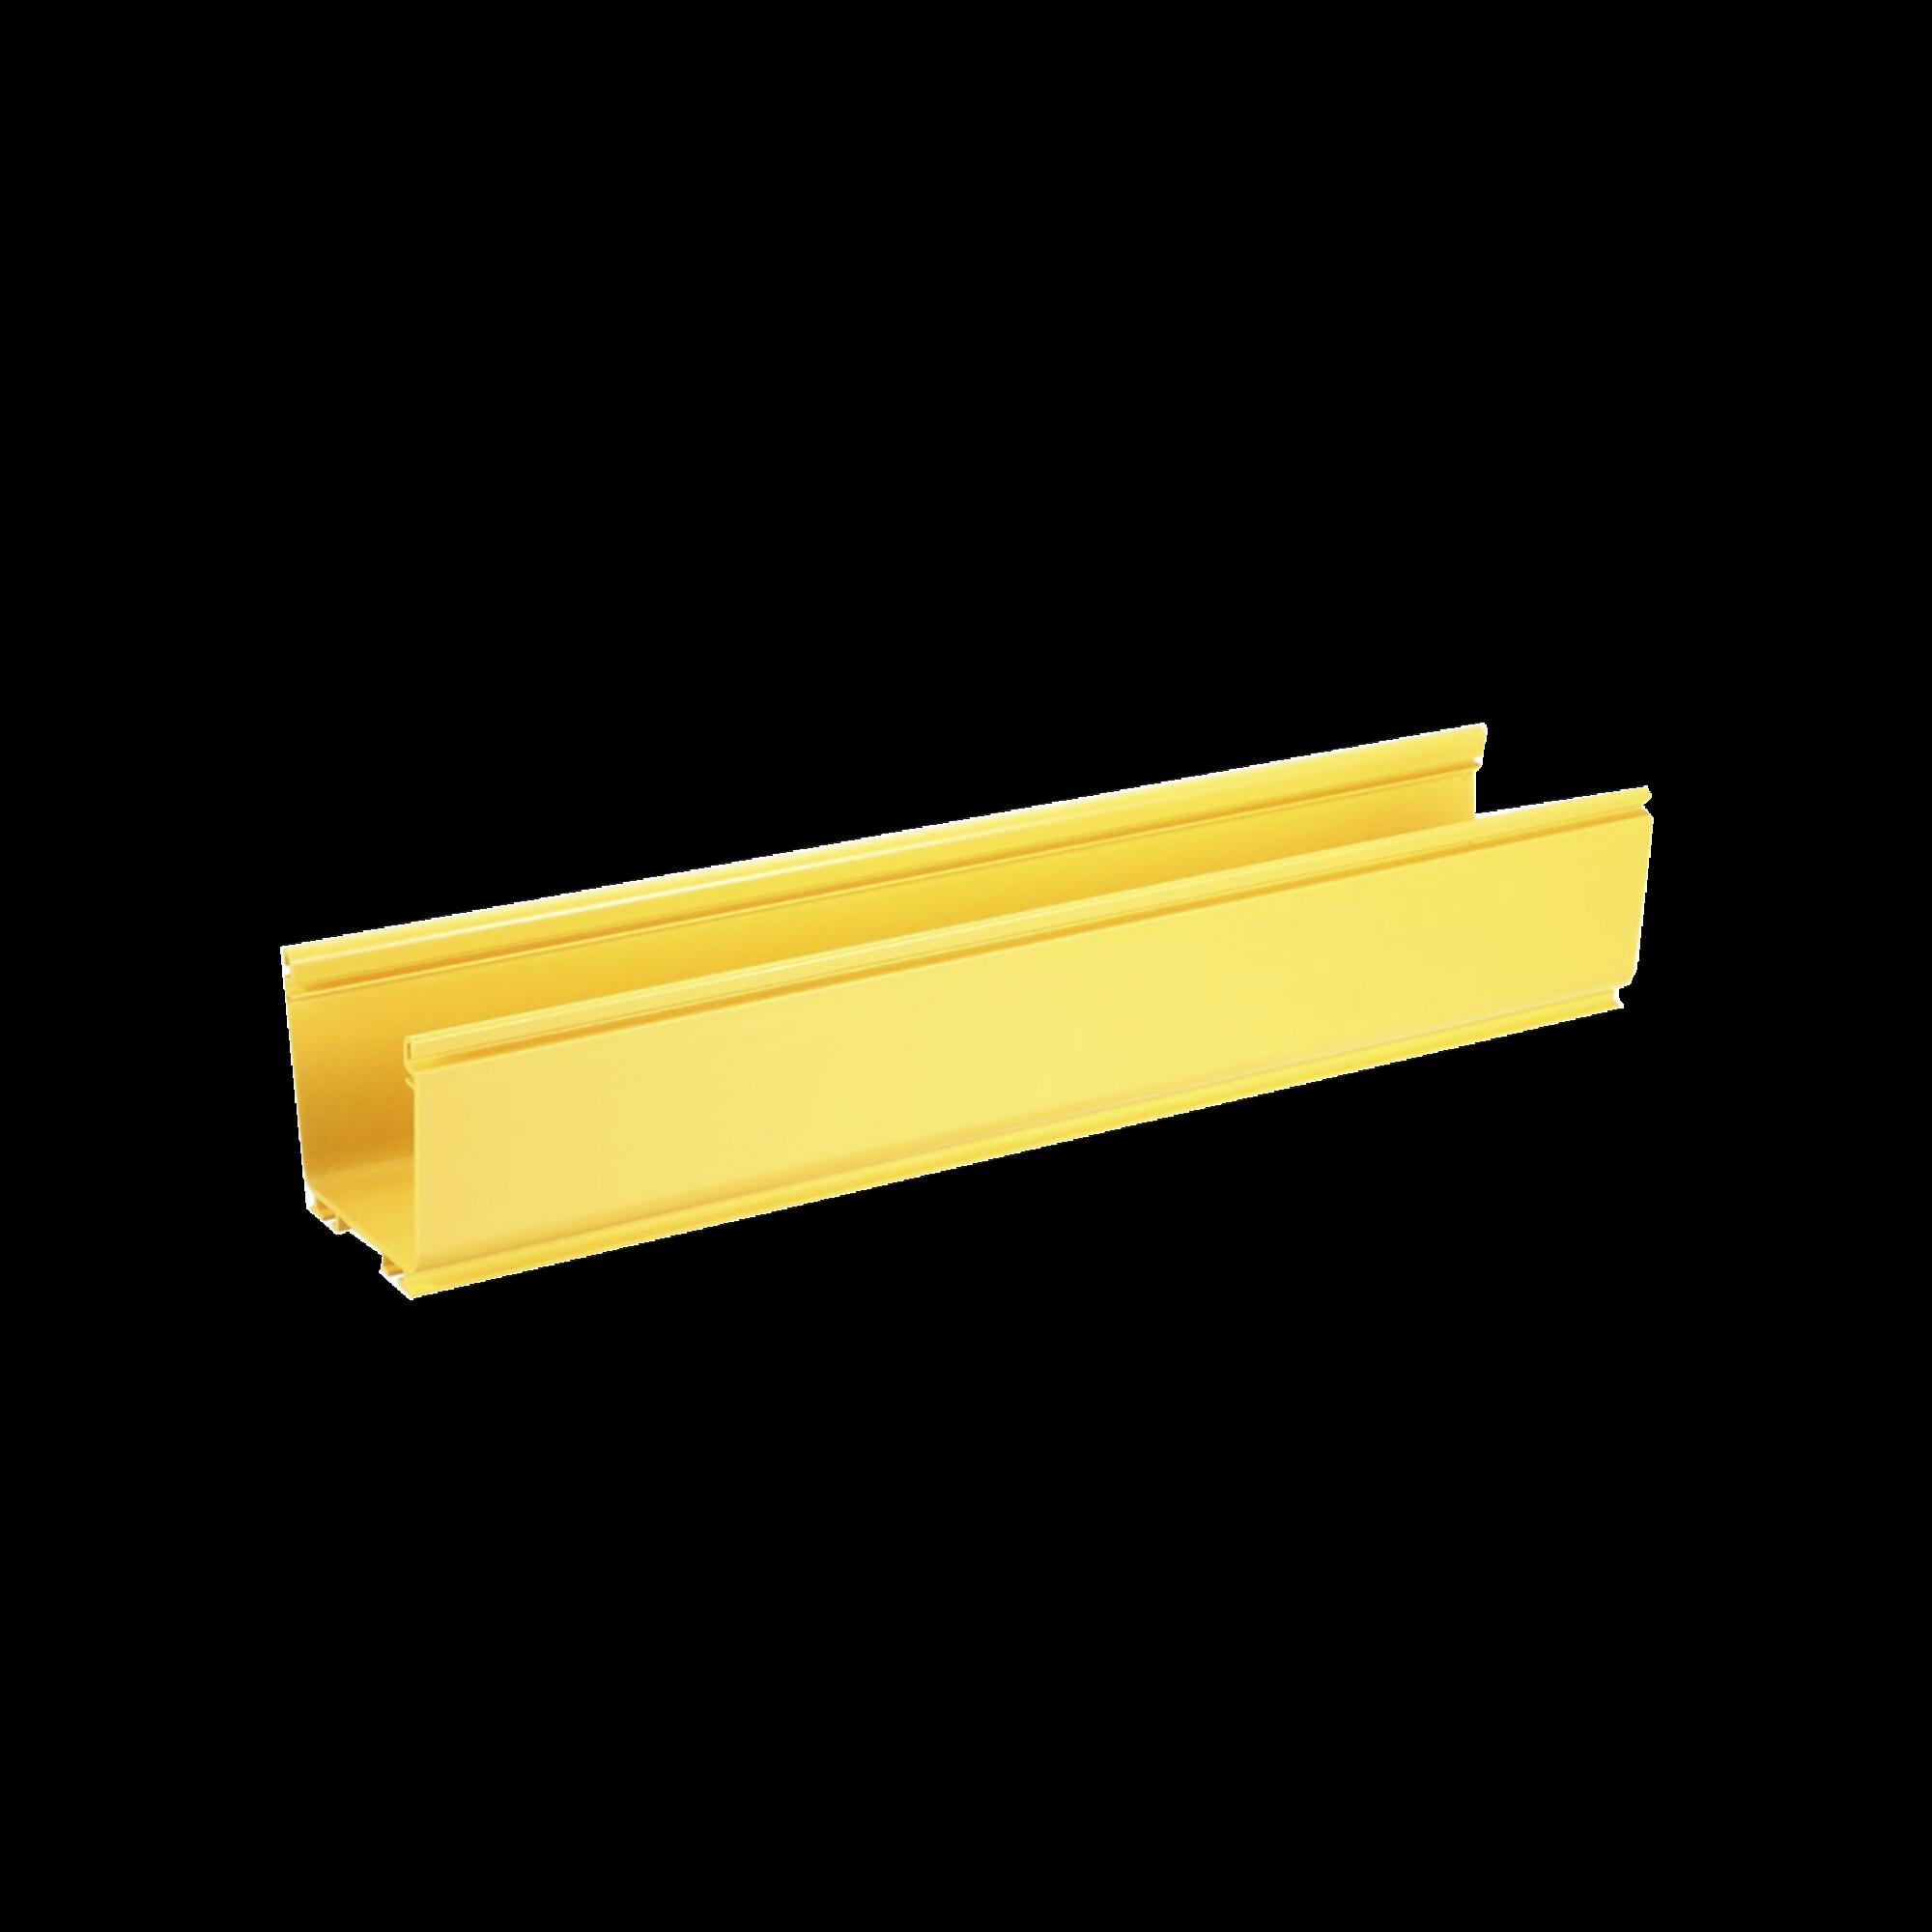 Canaleta FiberRunner? 4X4, de PVC Rigido, Color Amarillo, 1.8 m de Largo